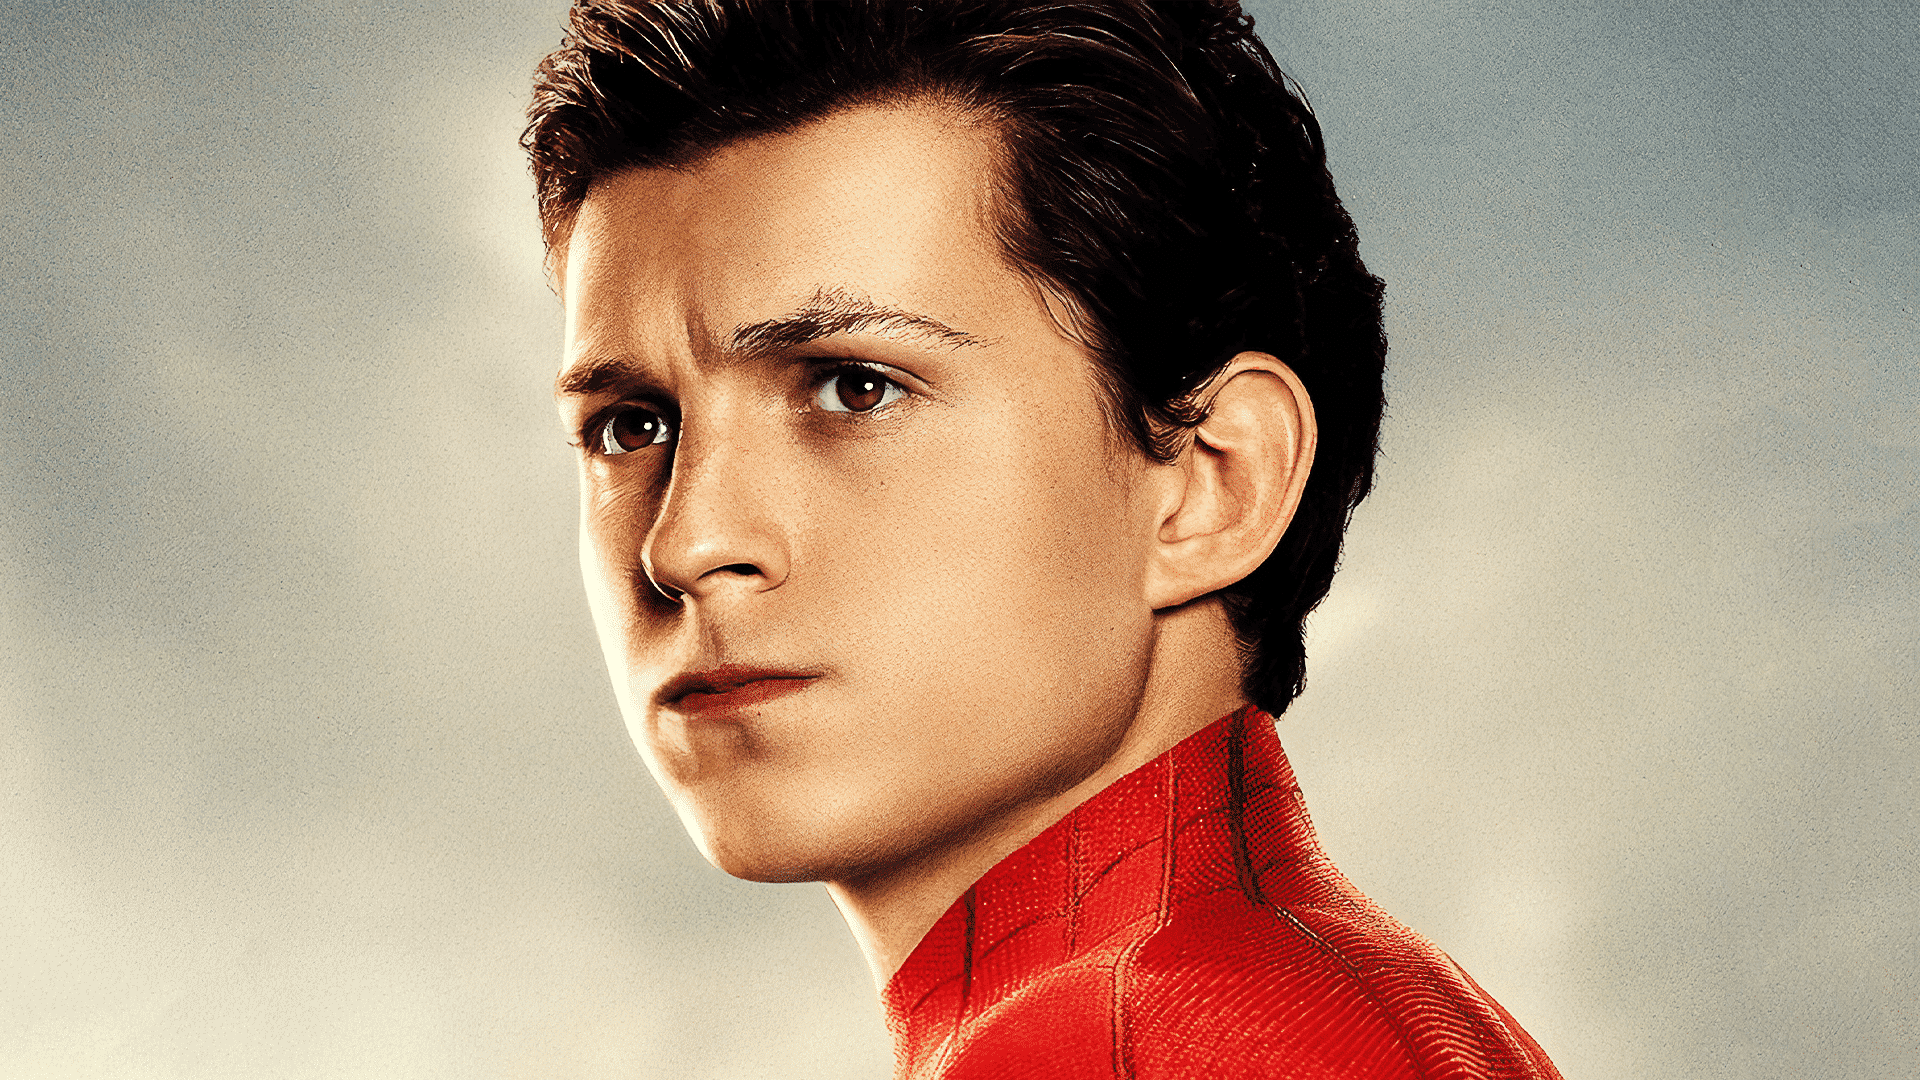 spider-man vo filme avengers 5